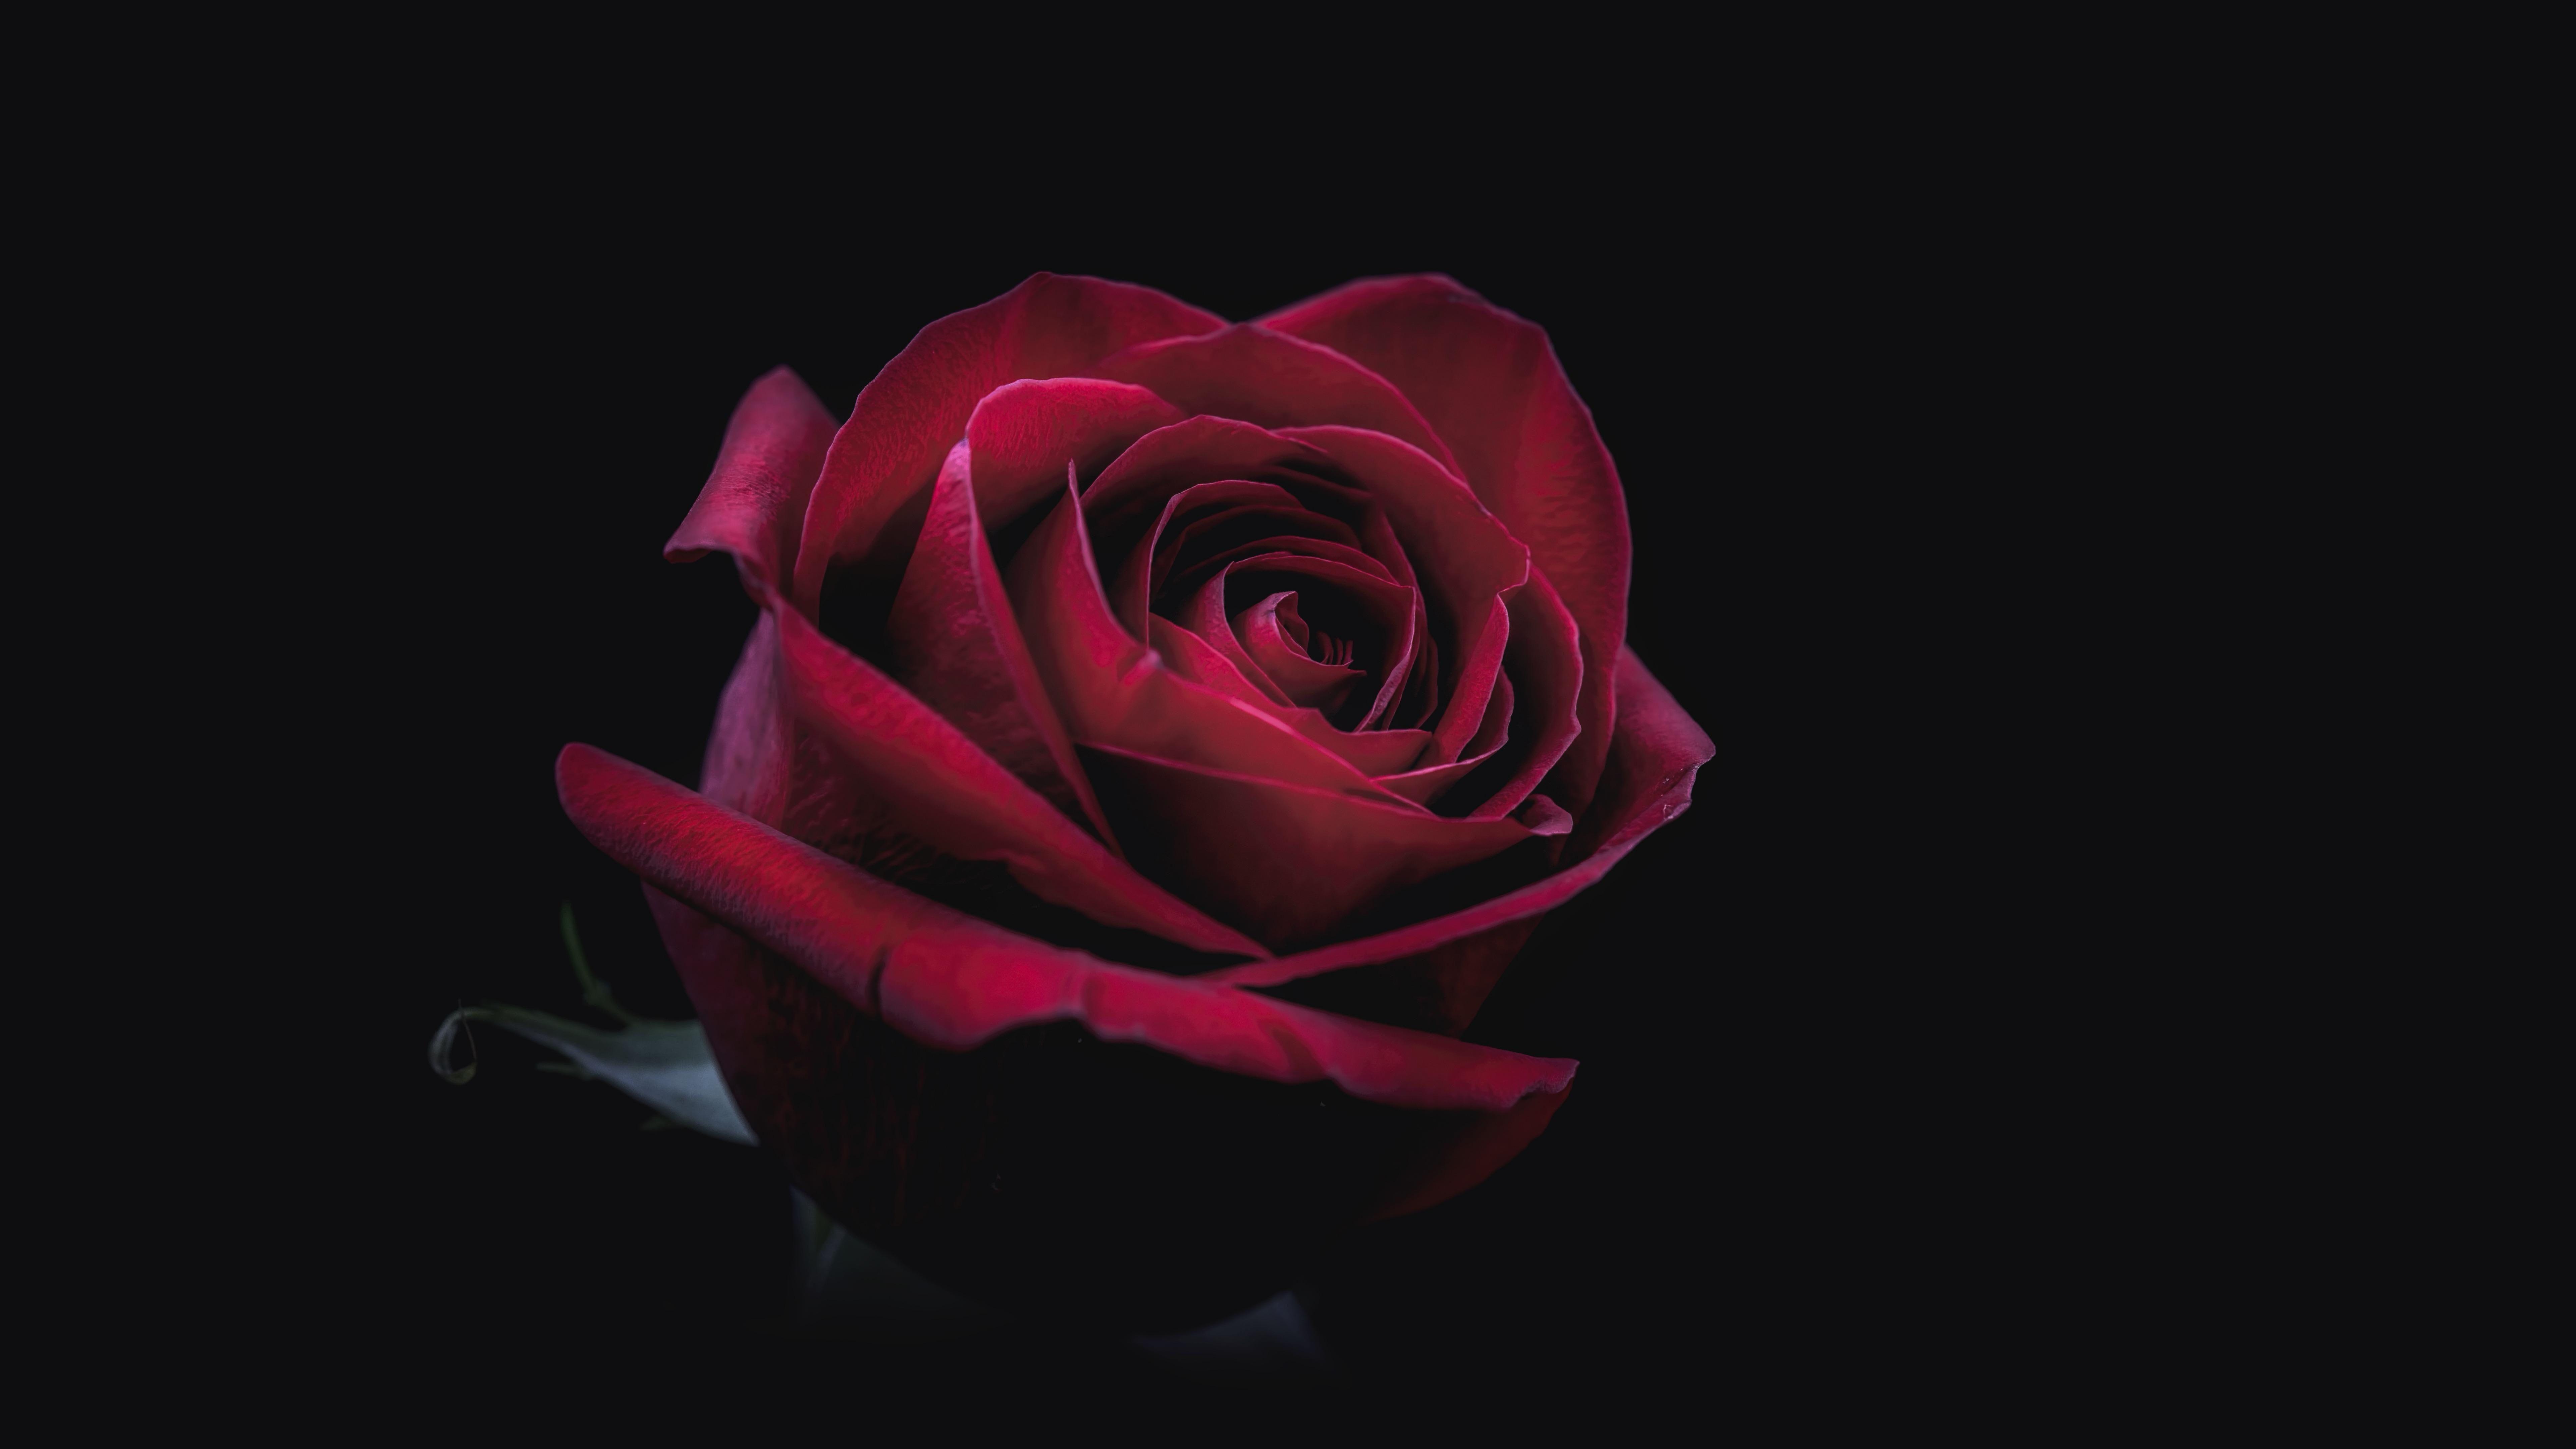 Red Flower Red Rose Rose Darkness 8k Uhd 8k Wallpaper Hdwallpaper Desktop In 2021 Garden Design Red Flowers Red Roses